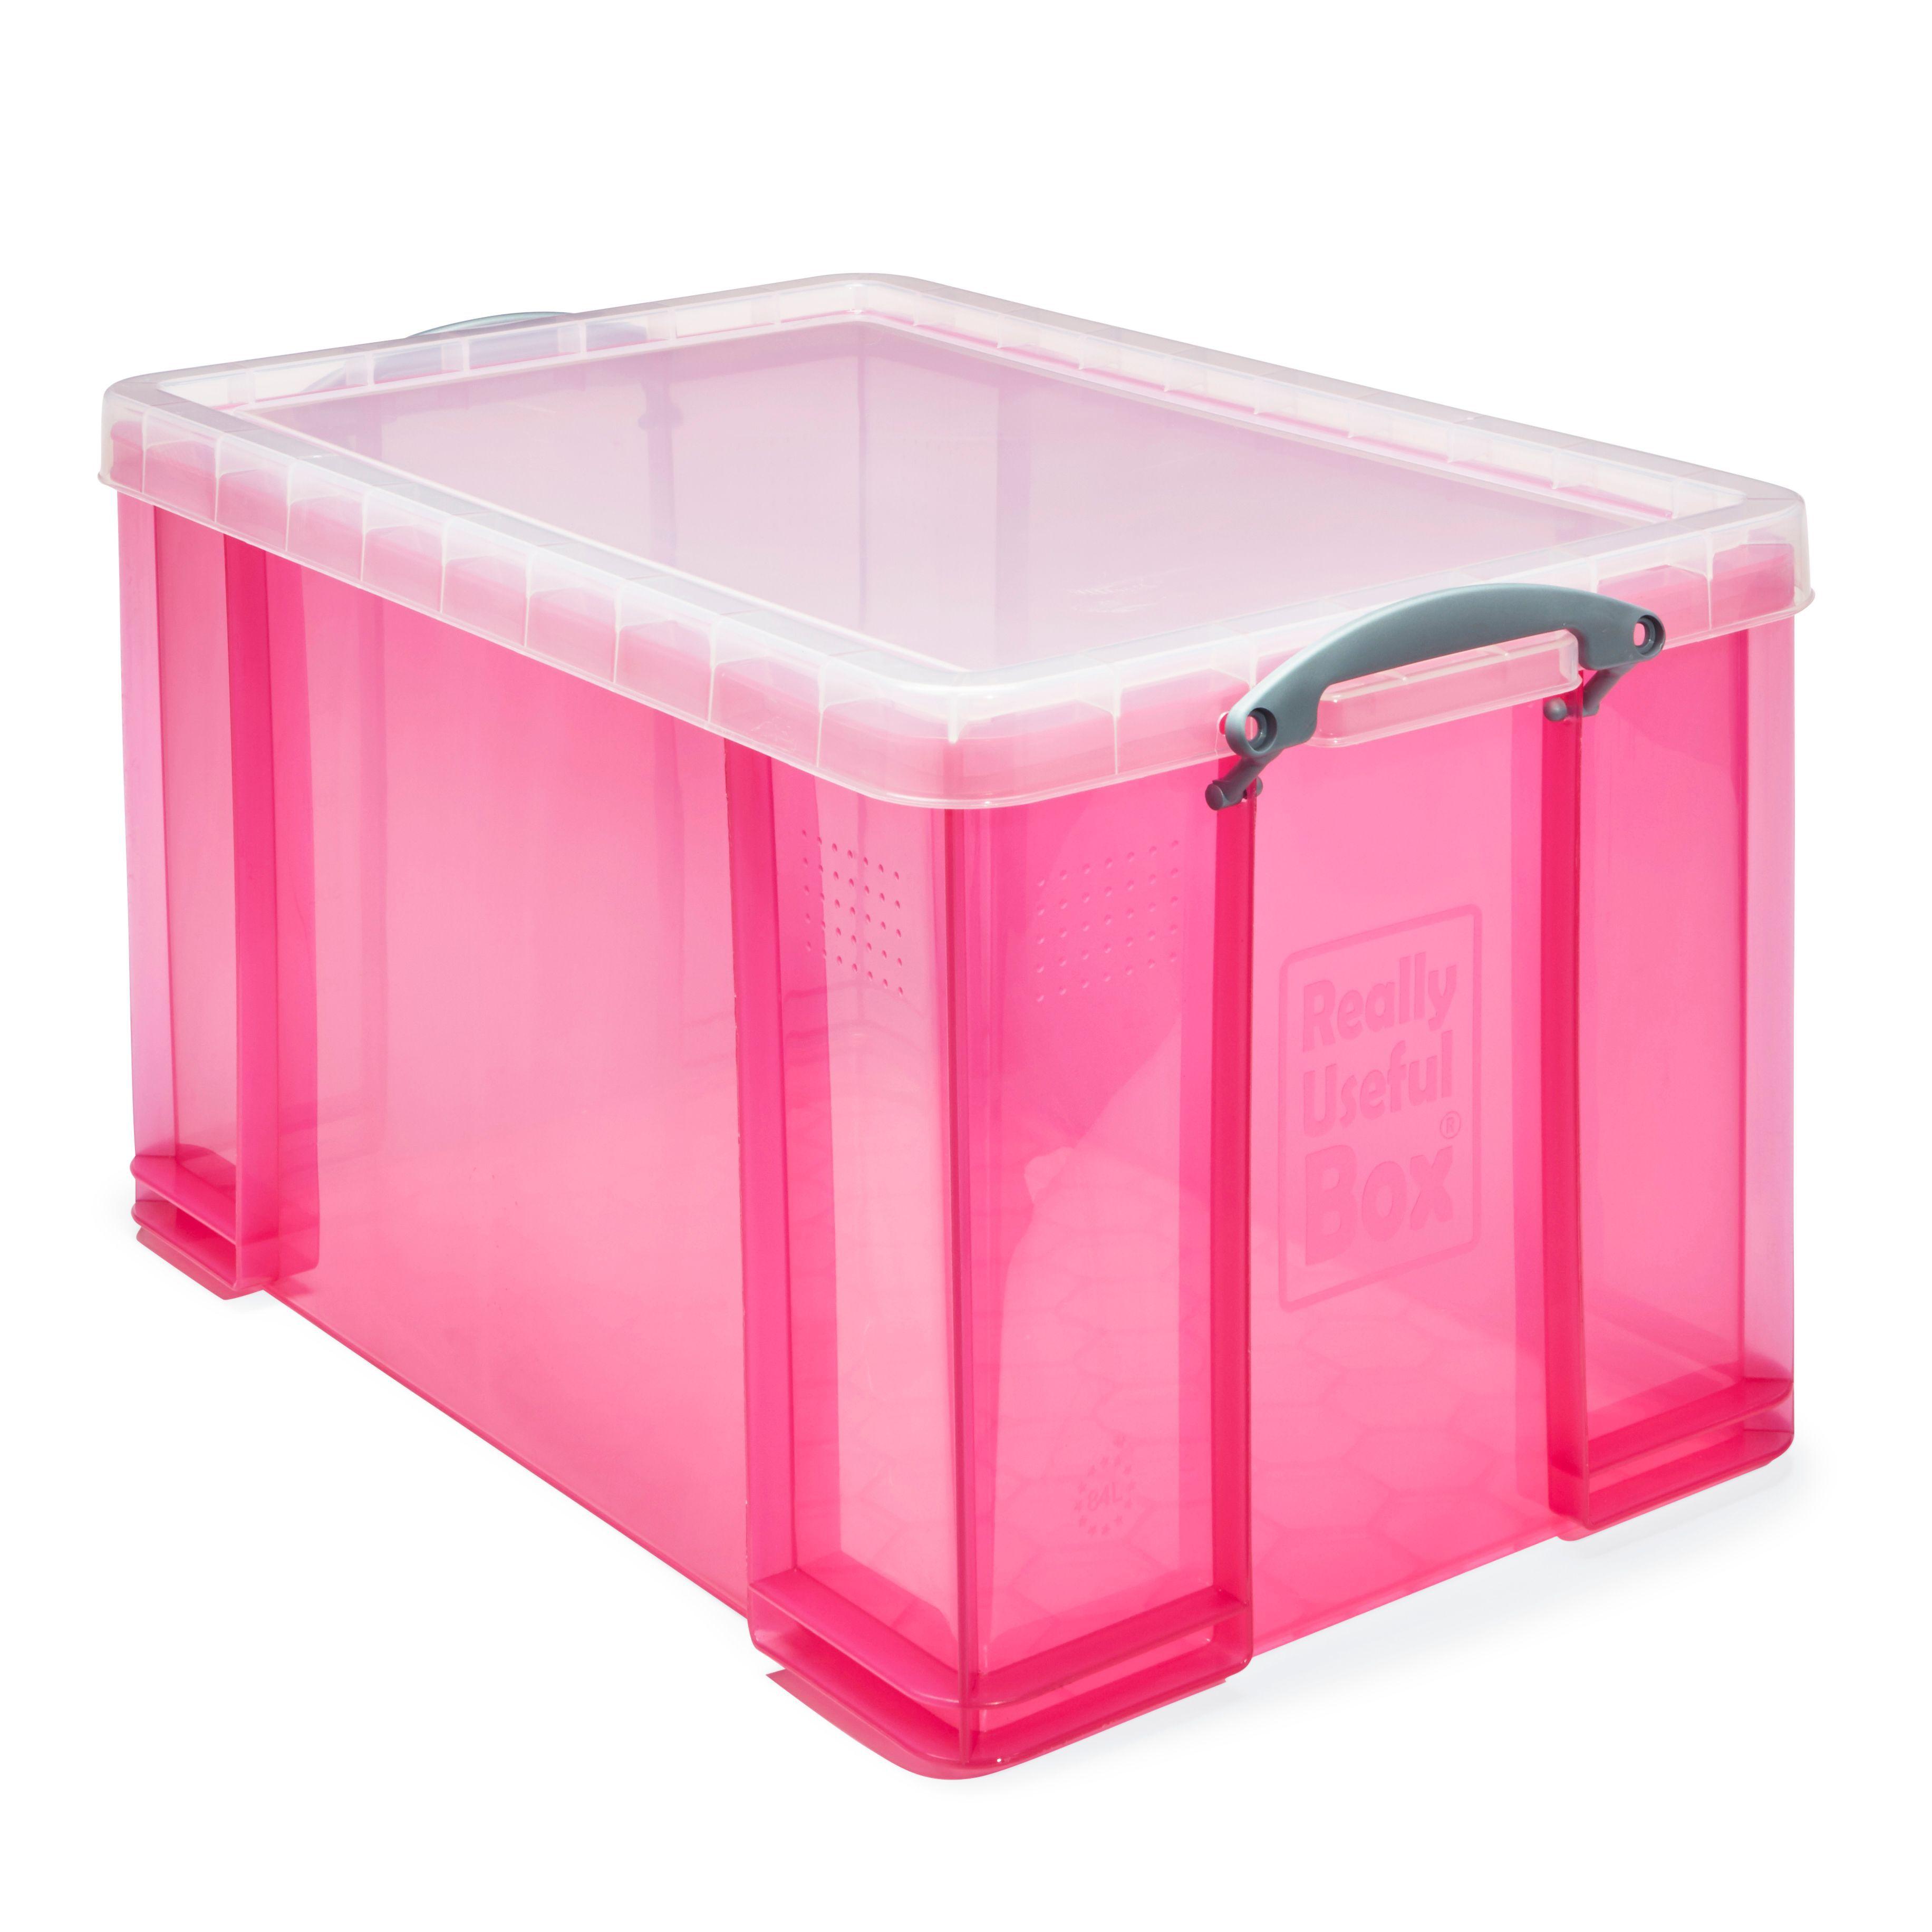 sc 1 st  Bu0026Q & Really Useful Pink 84L Plastic Storage Box | Departments | DIY at Bu0026Q